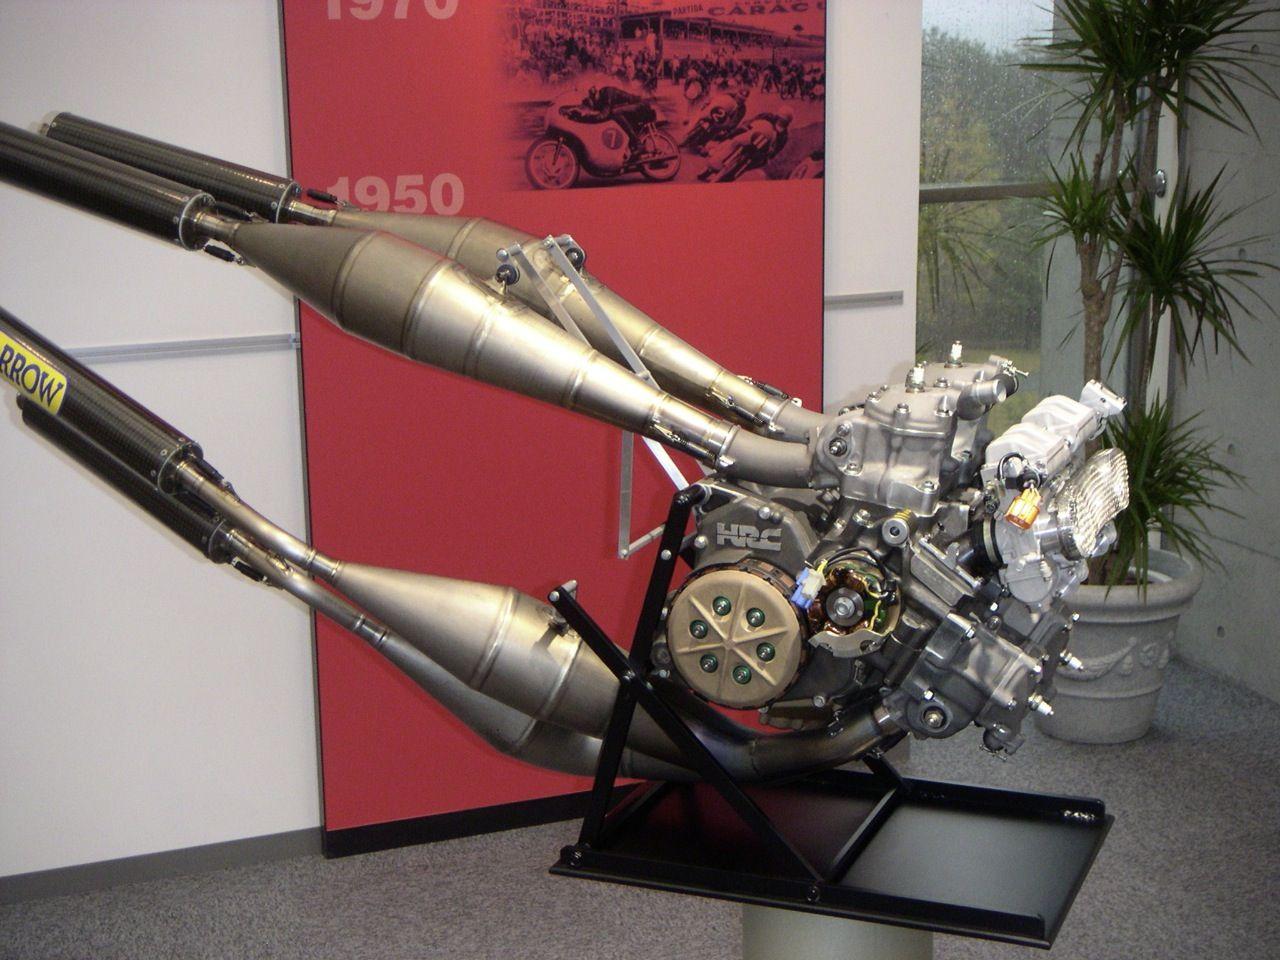 Honda Racing Moto Gp: Honda V4 Water Cooled Moto GP Engine